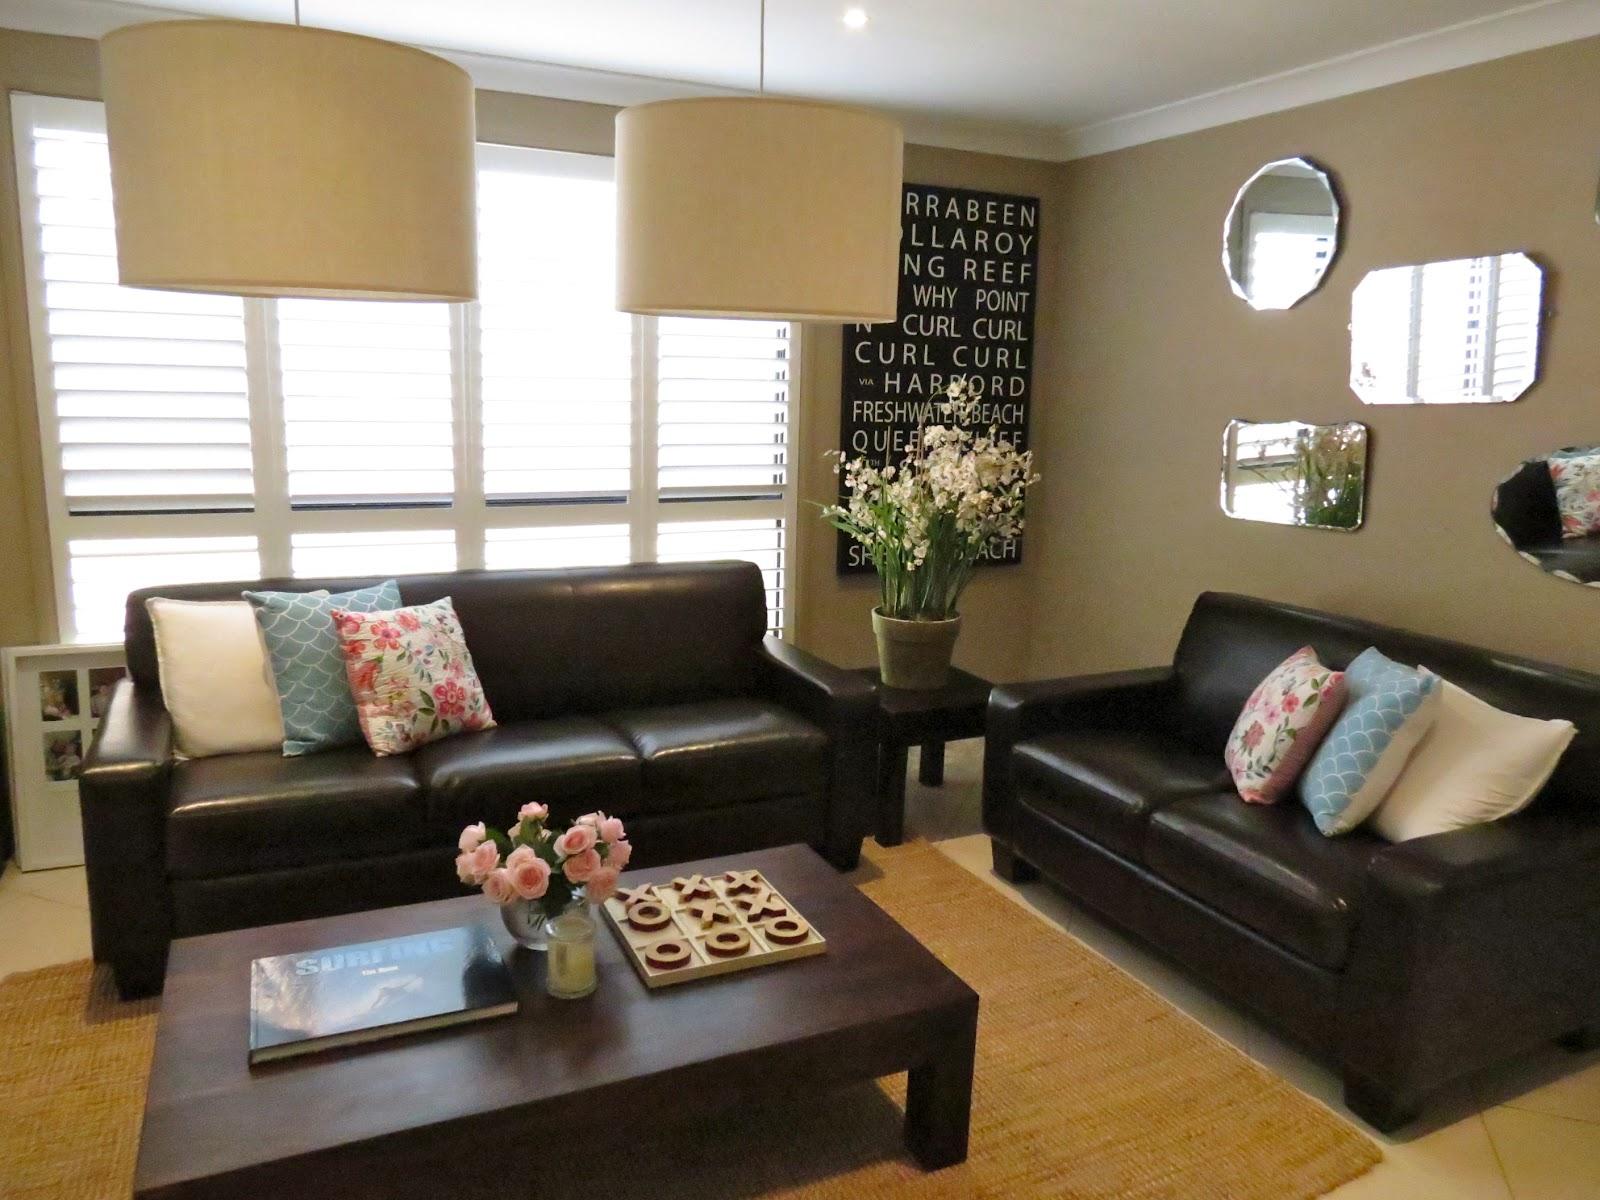 imagini pentru black sofa living aqua wall design wohnideen pinterest wohnideen. Black Bedroom Furniture Sets. Home Design Ideas